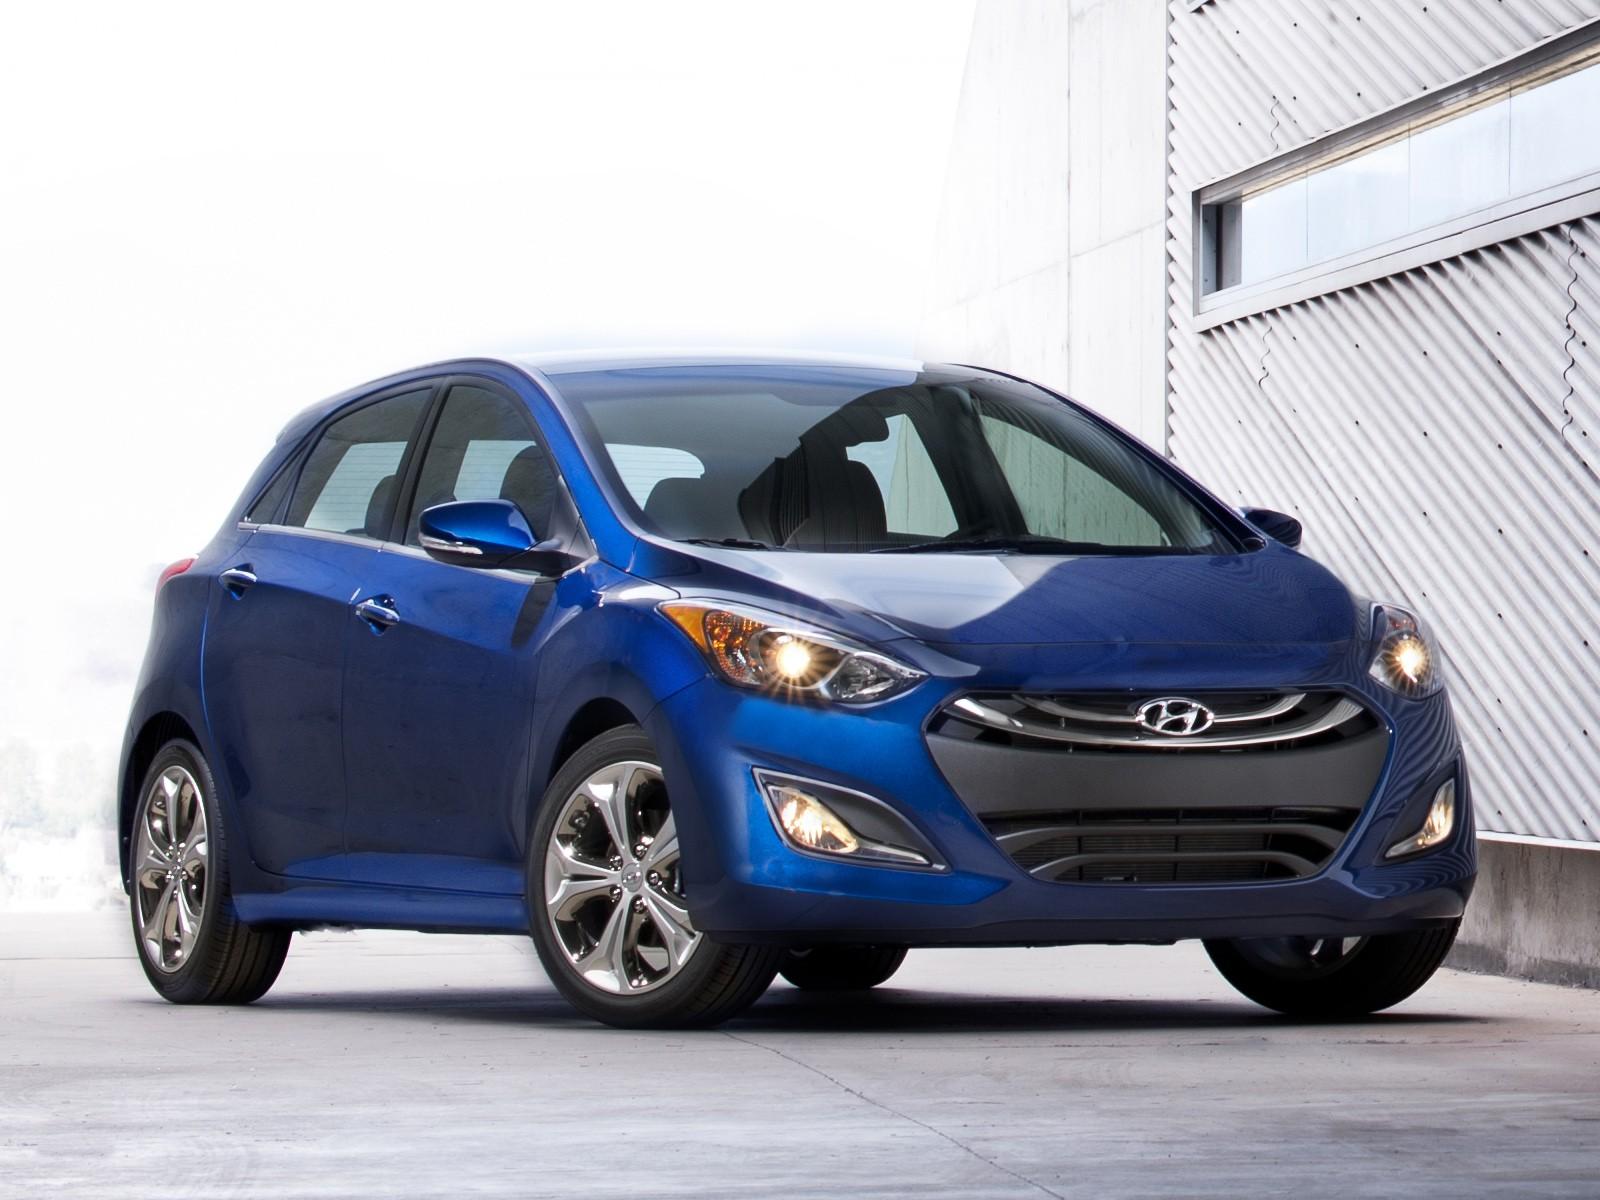 Hyundai Elantra Gt Specs Photos 2012 2013 2014 2015